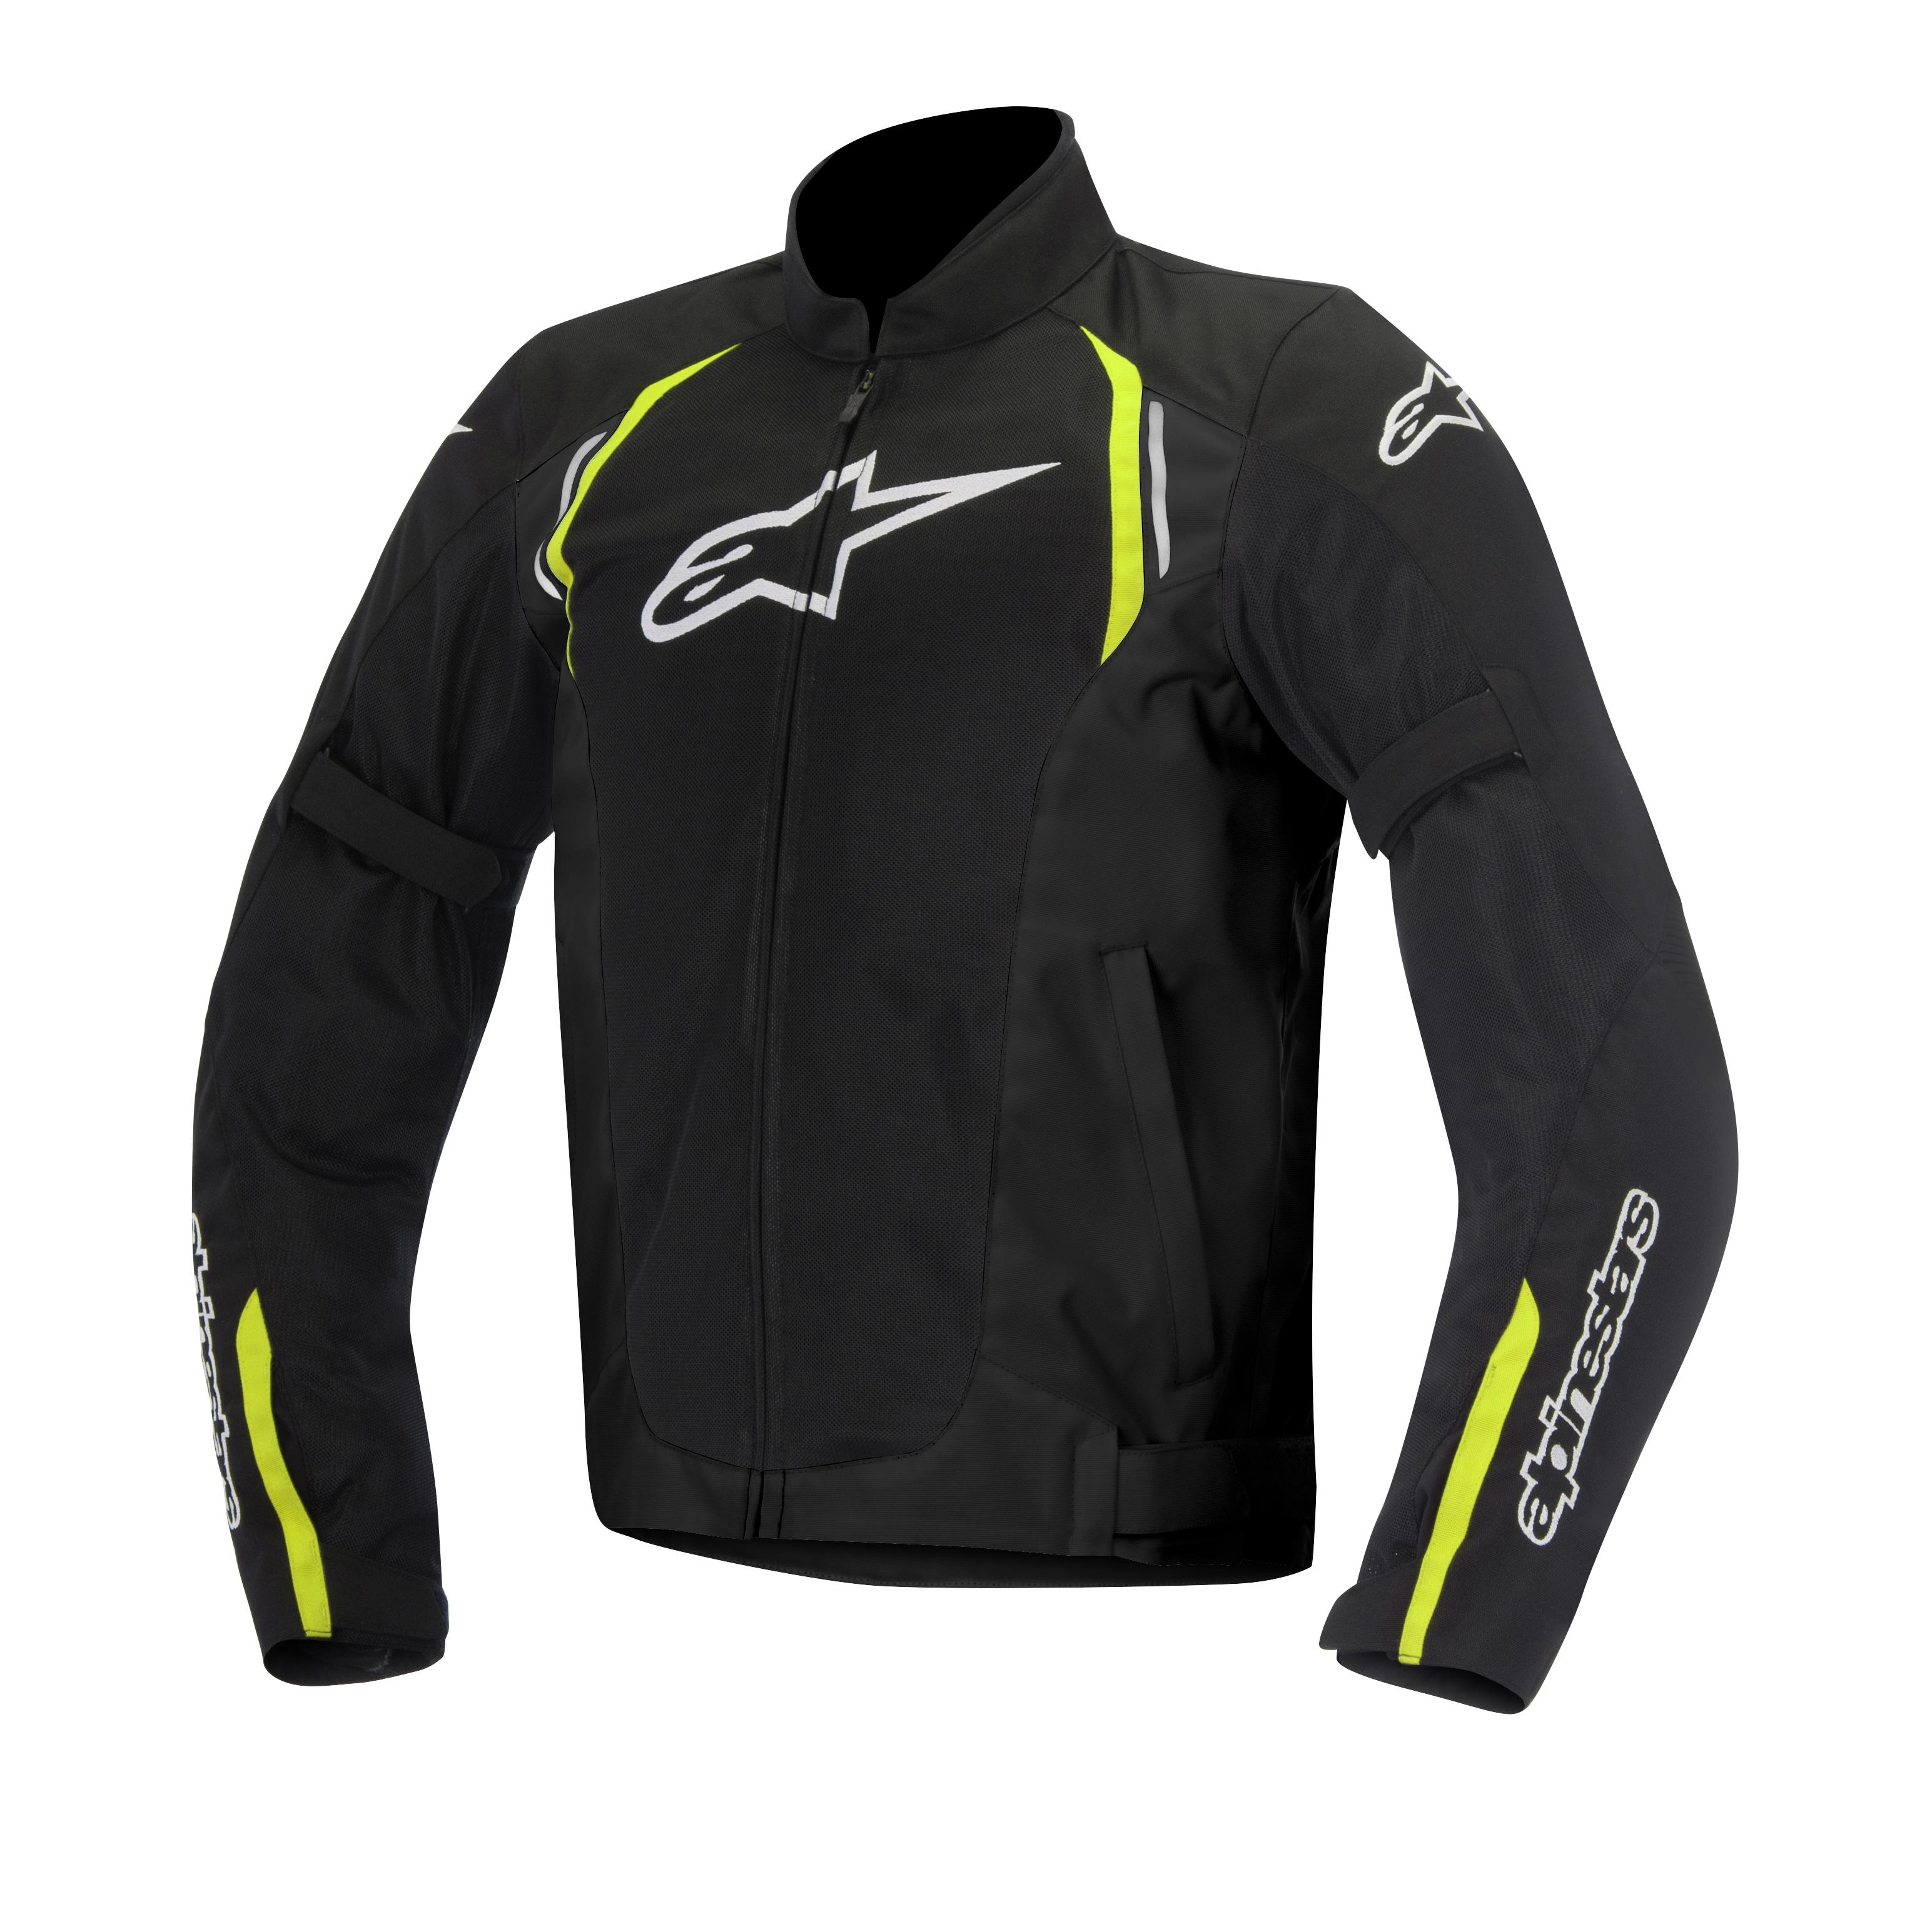 Giacca moto Alpinestars Ast Air TX nero giallo fluo